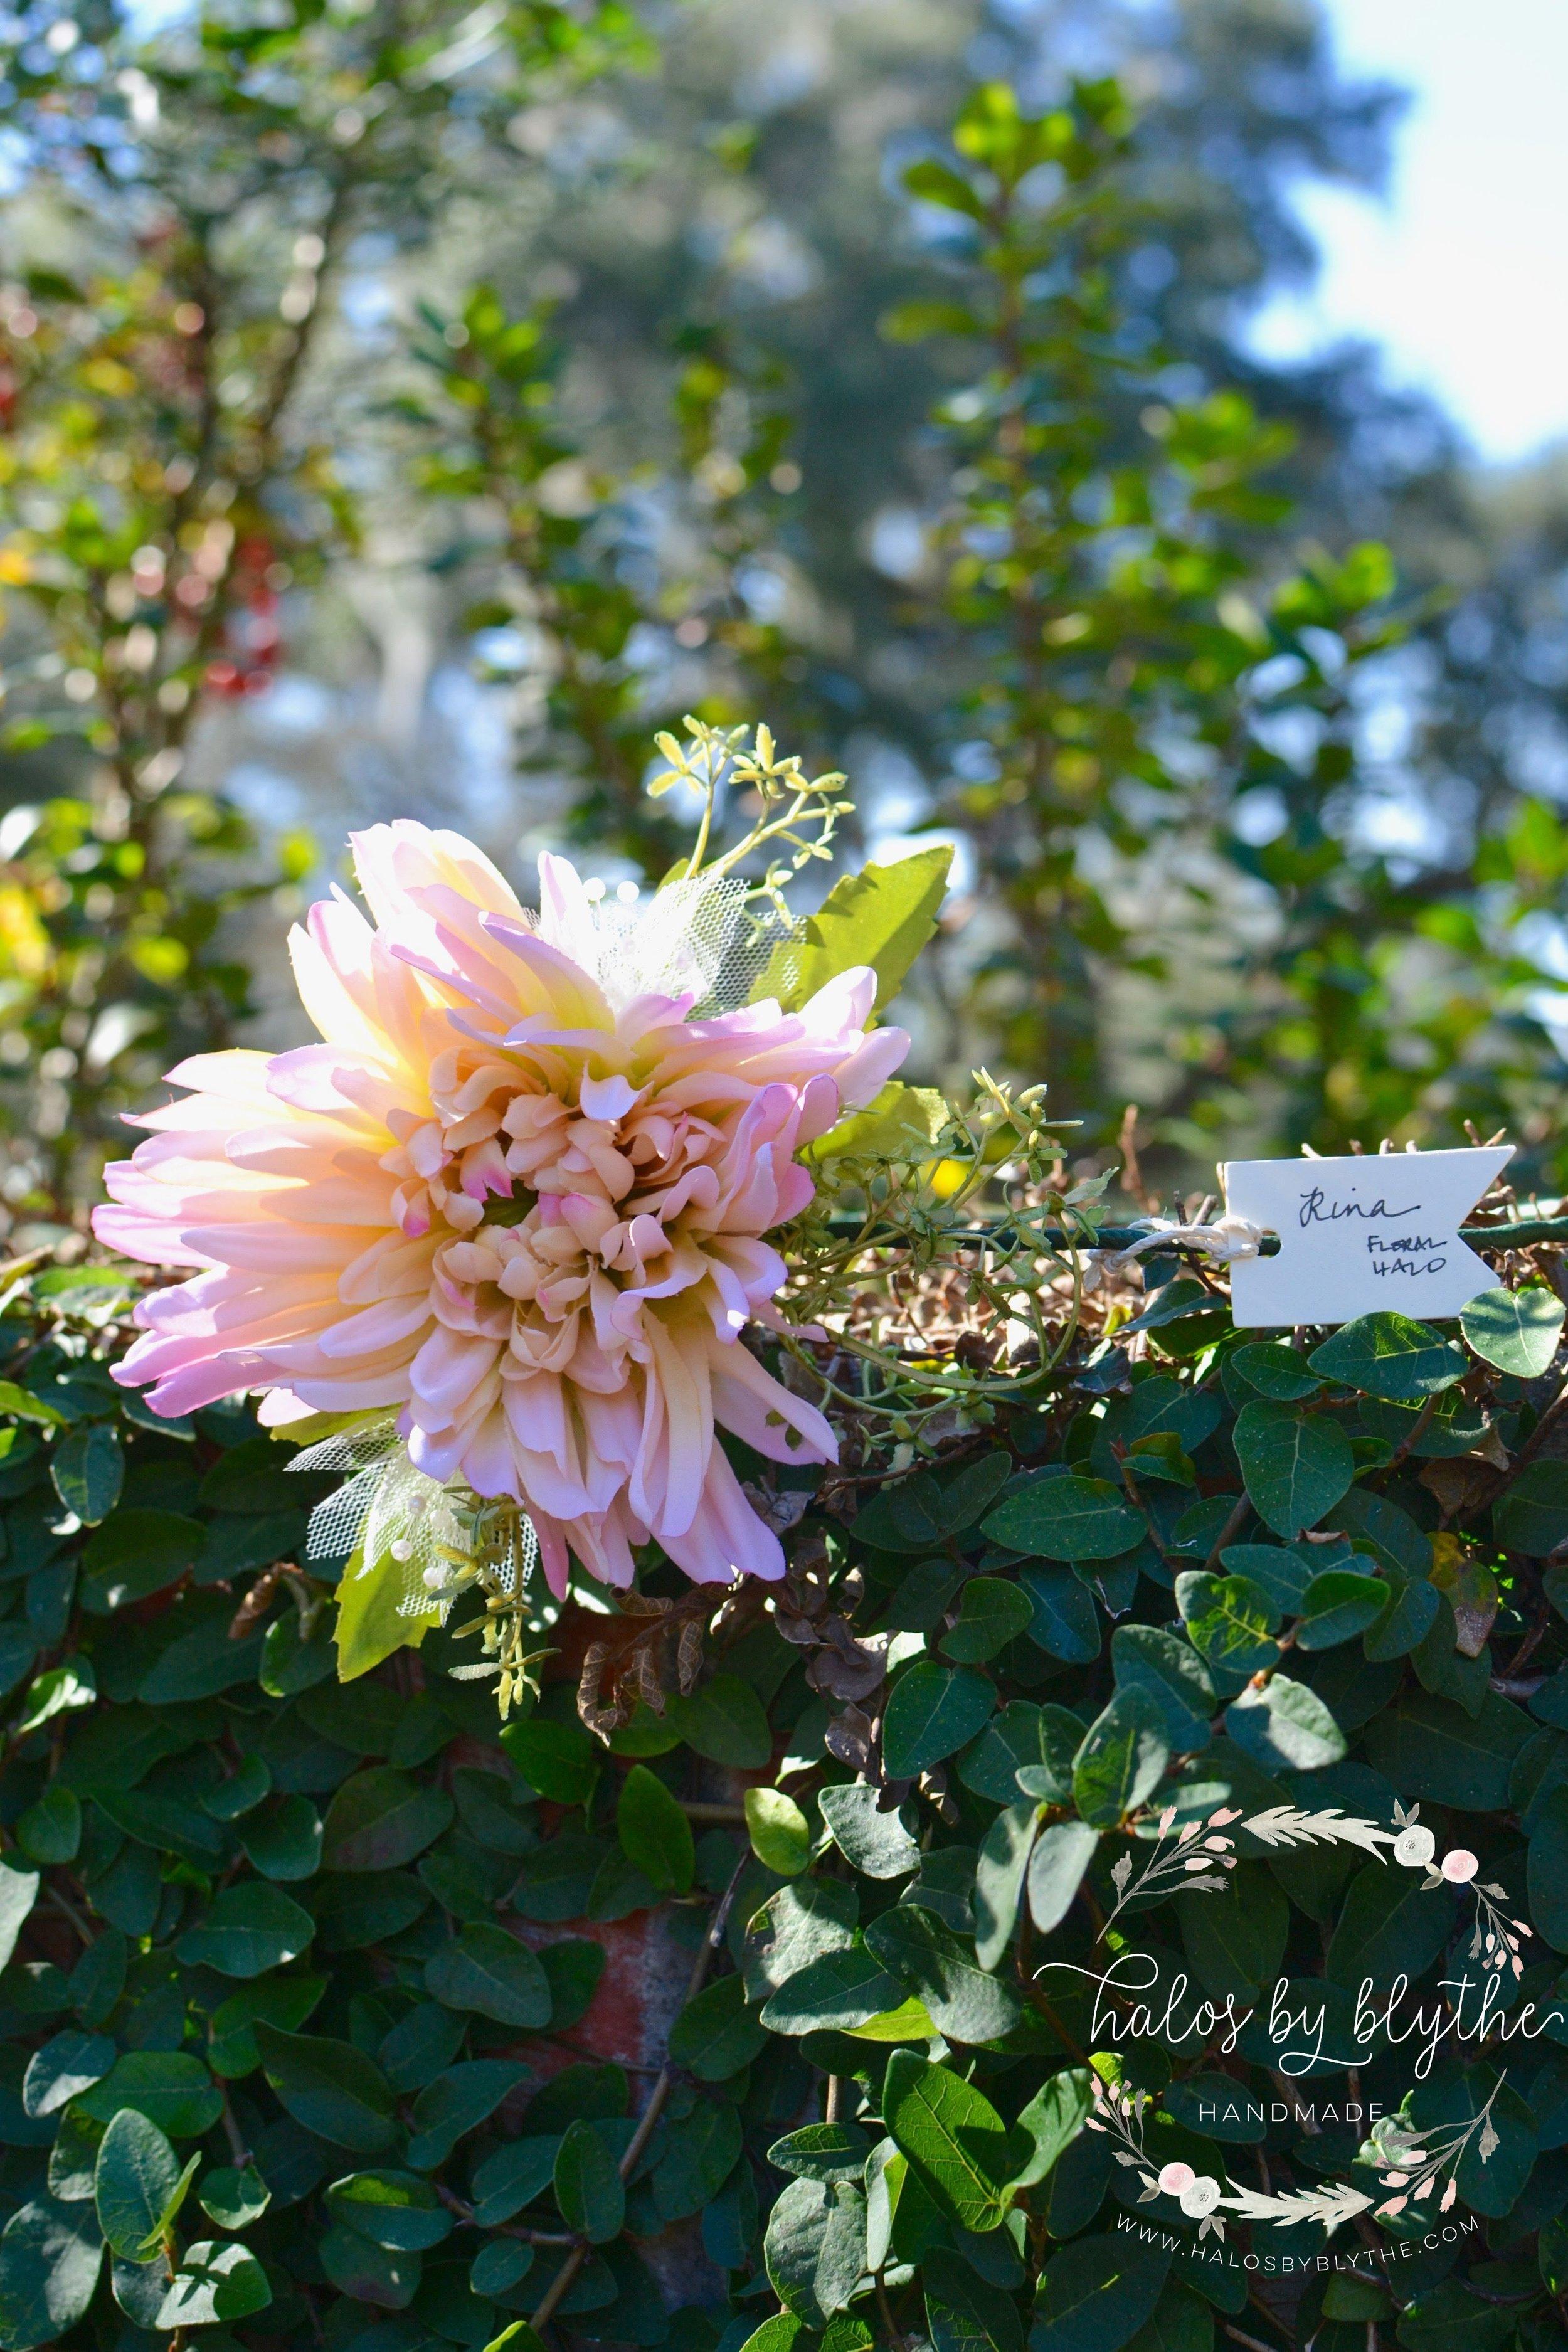 Rina Floral Halo